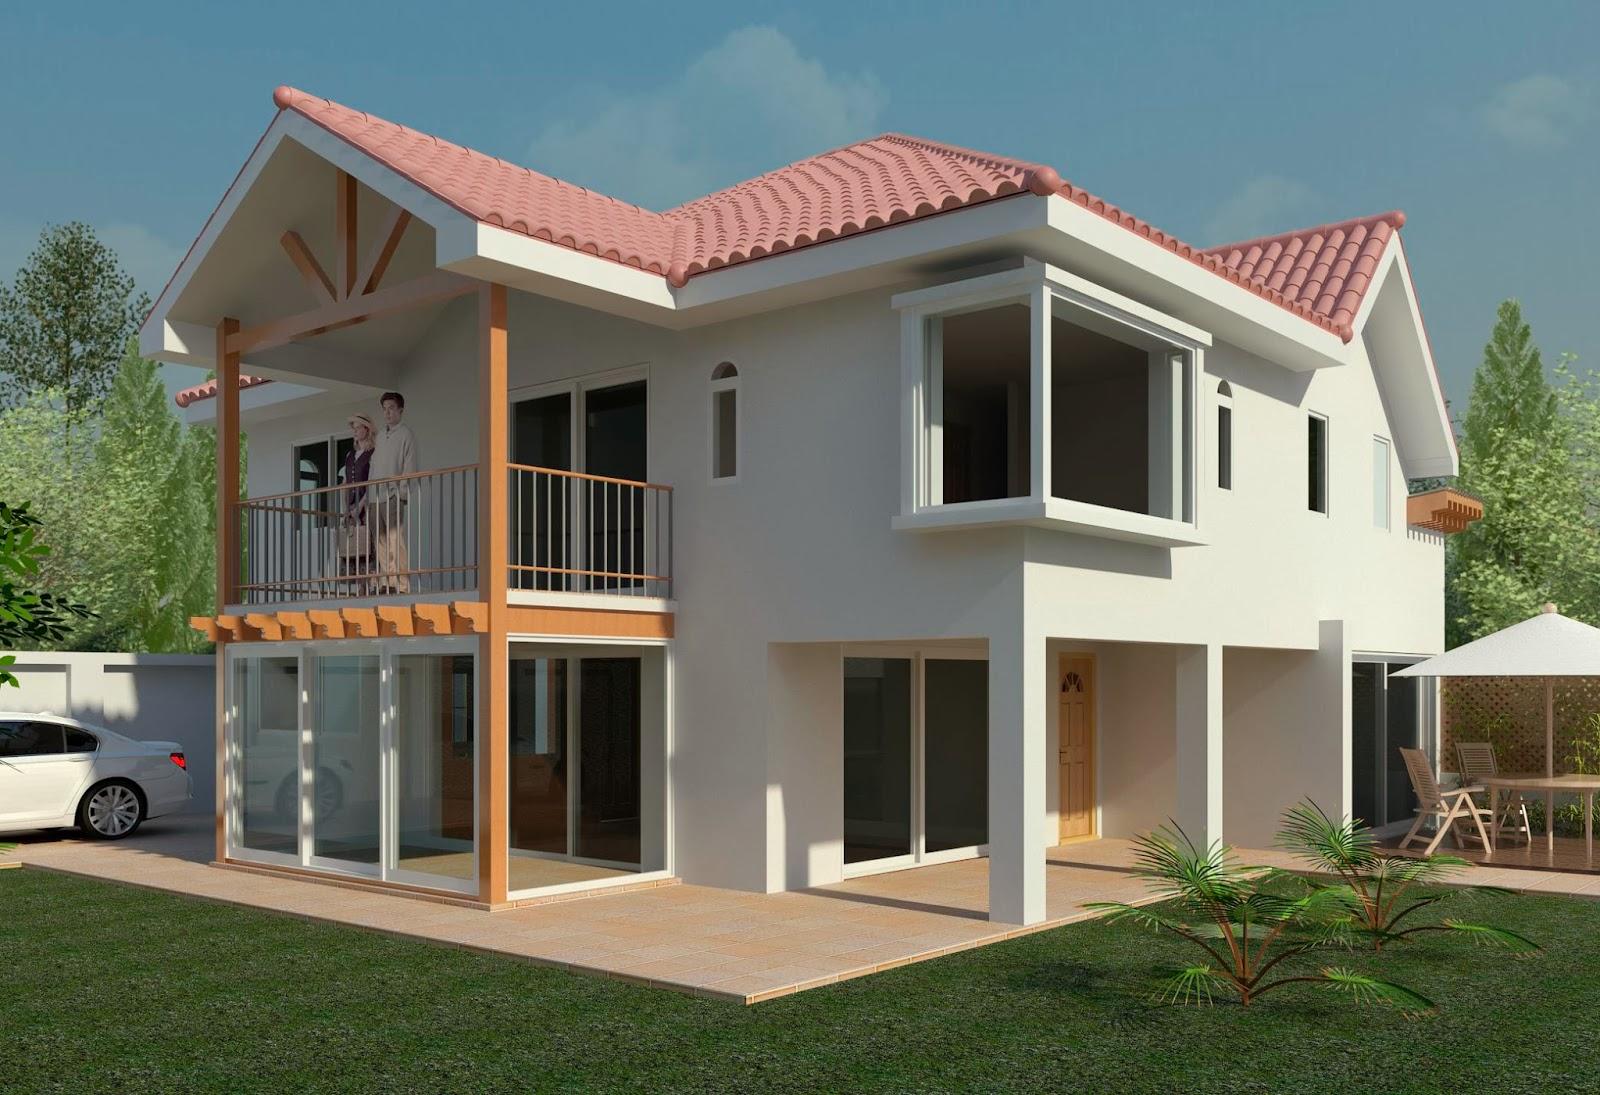 Madibujanteproyectista proyecto vivienda unifamiliar 3 for Casa moderna revit